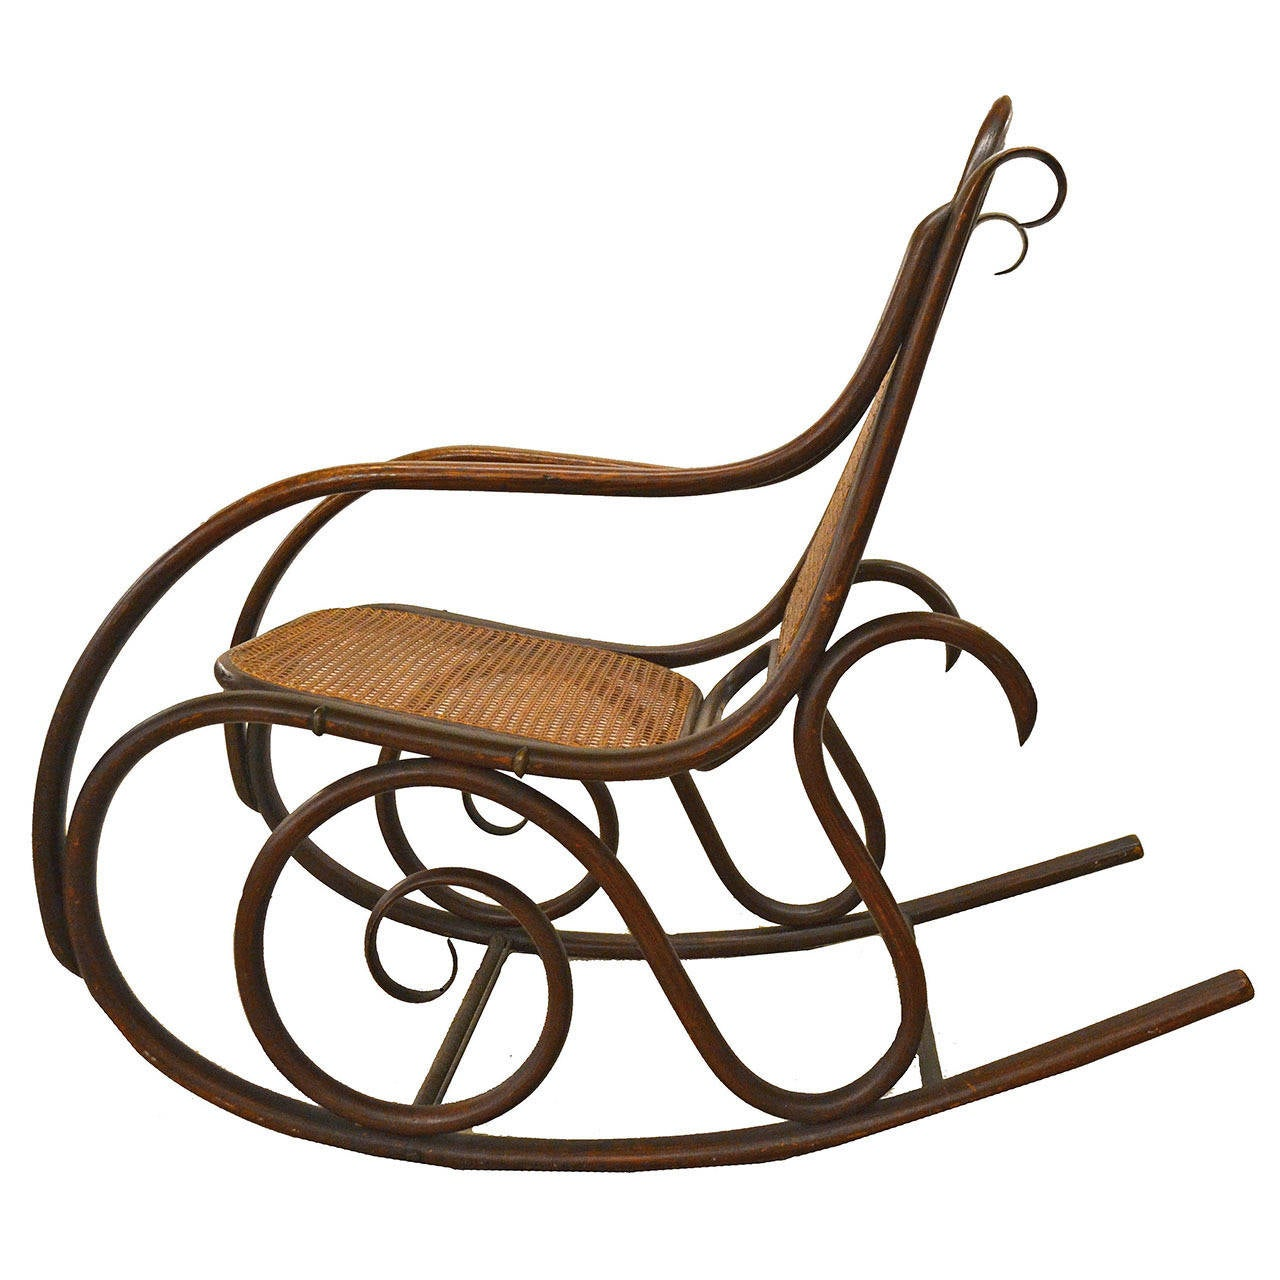 bent wood rocking chair antique wooden desk on wheels 19th century thonet bentwood rocker at 1stdibs